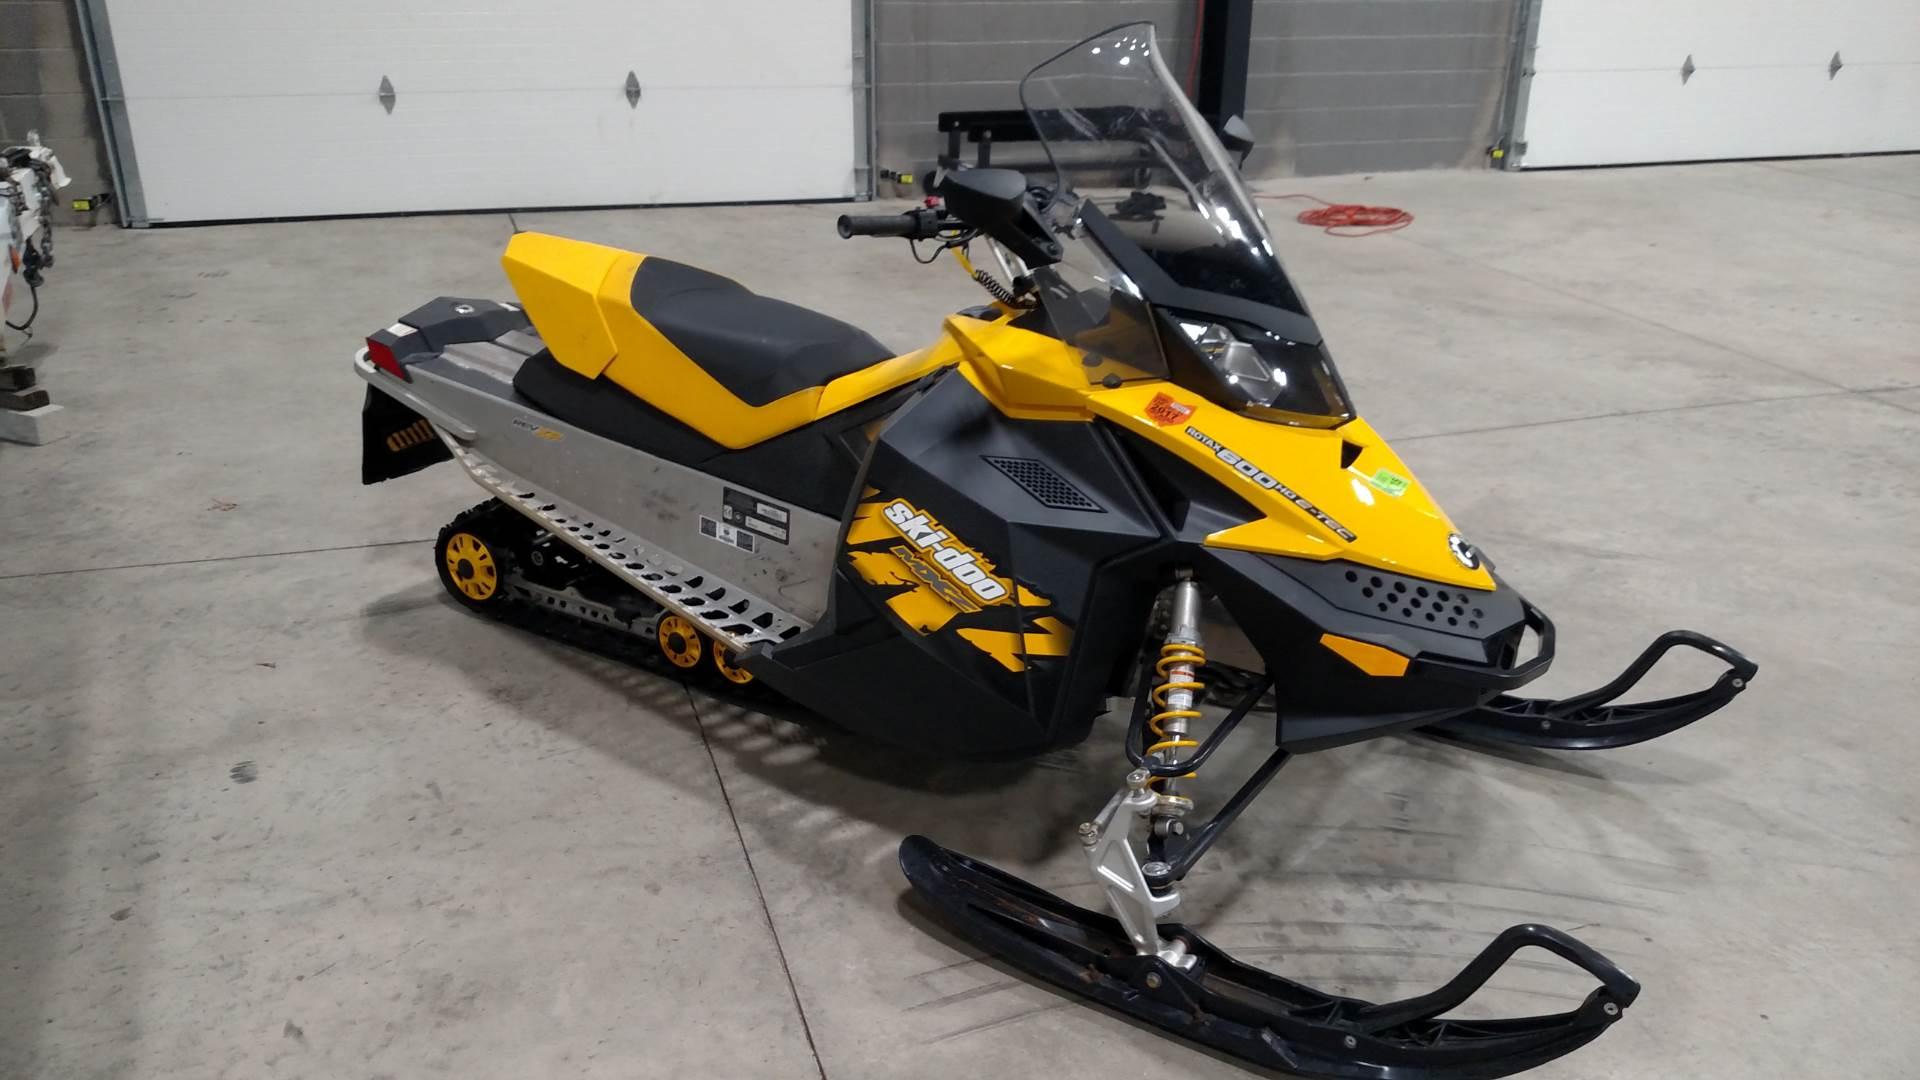 2009 MX Z Adrenaline 600 H.O. E-TEC